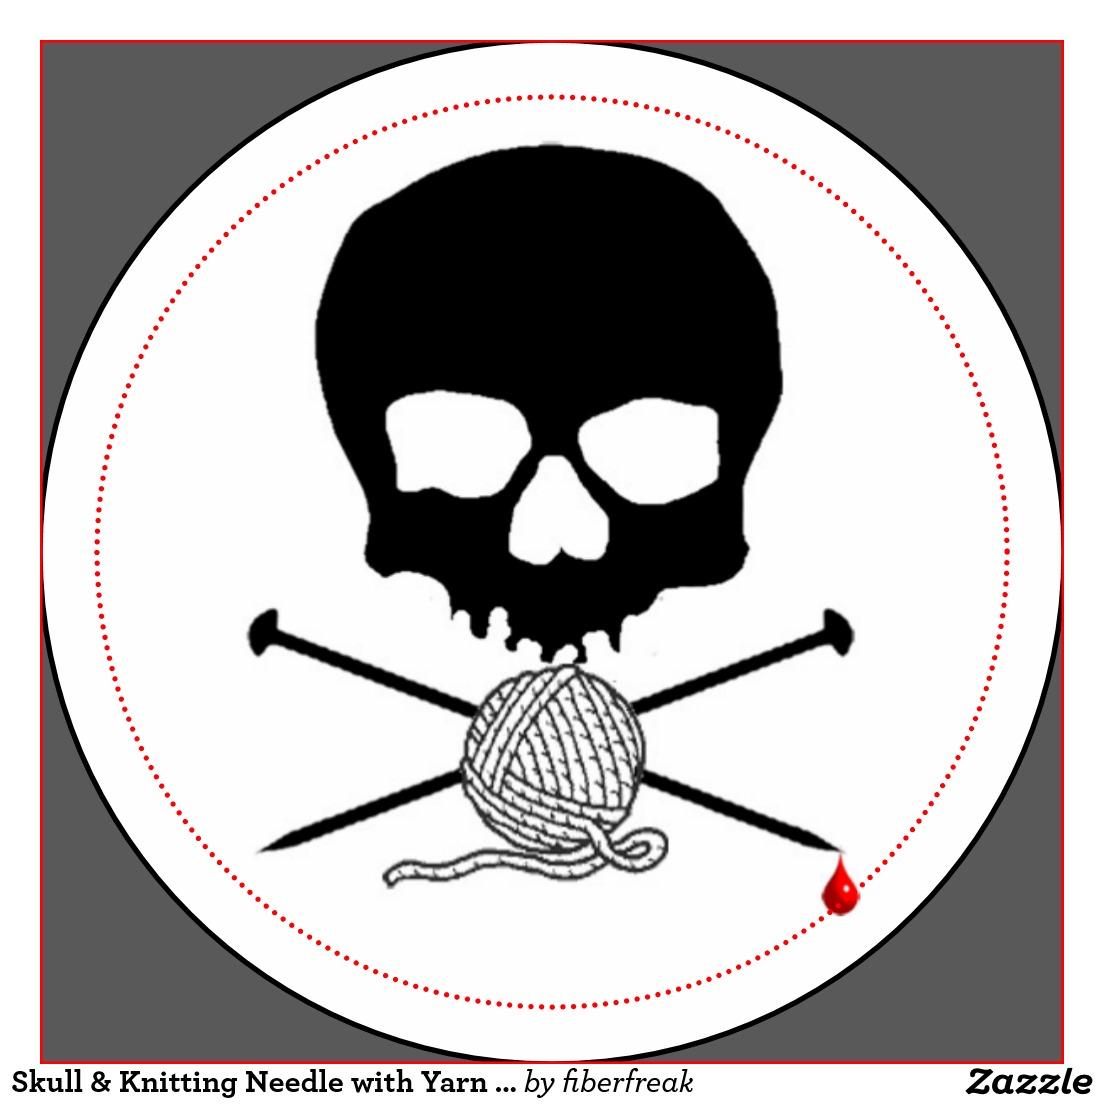 skull_knitting_needle_with_yarn_button-r03d841d44b474c90b1a3db4690905b1e_x7efx_1024